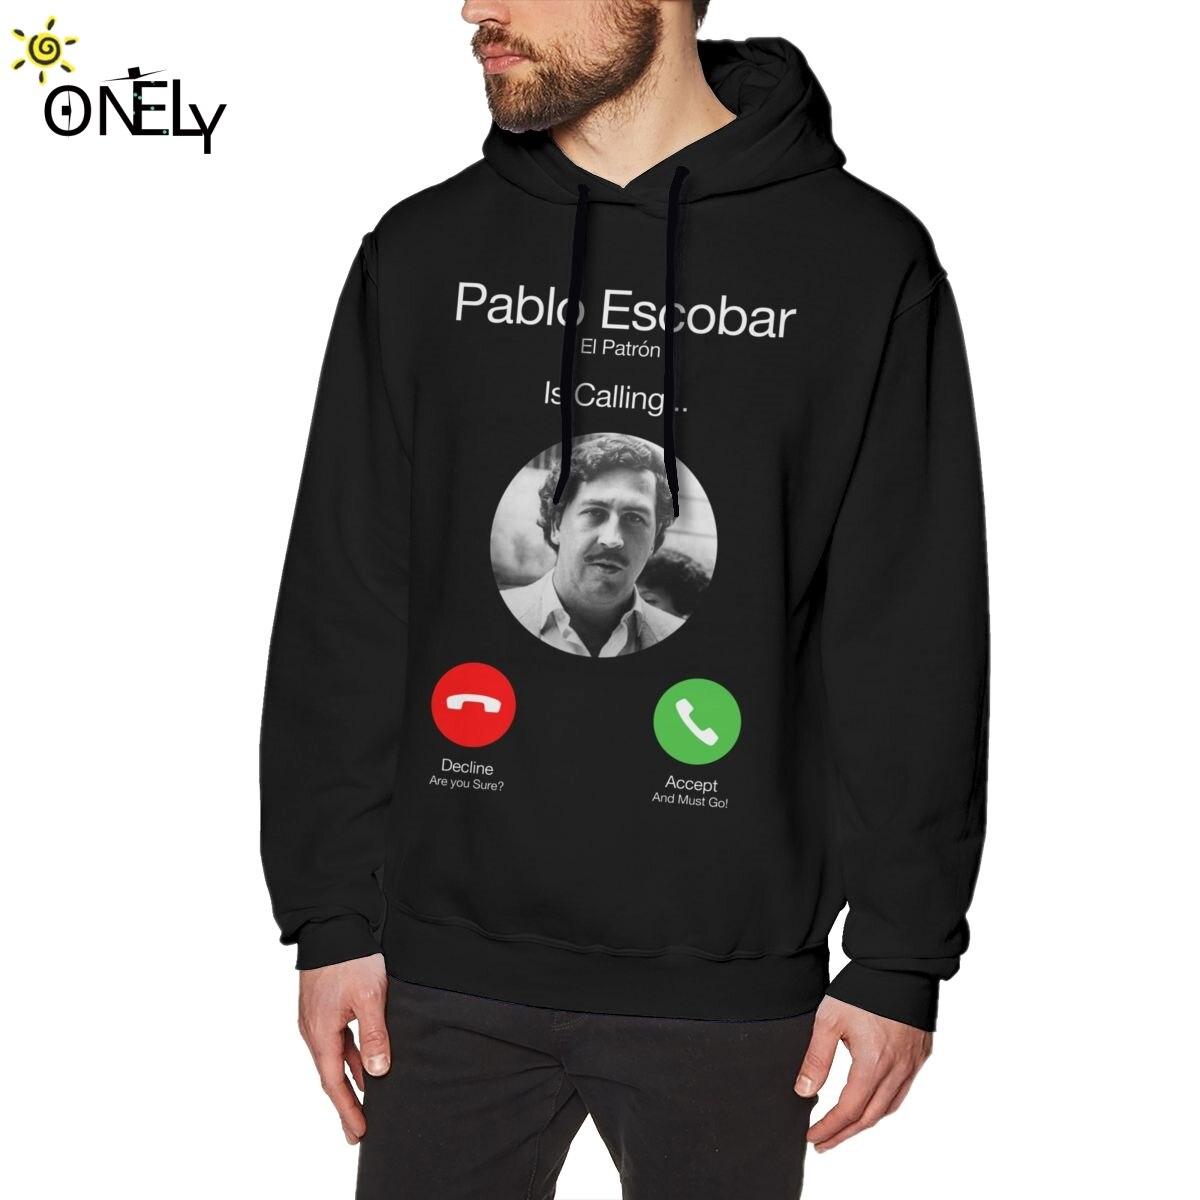 Pablo Escobar Calling Men's Hoodies  El Patron Funny Telephone Sweatshirt Unisex Graphic Camiseta Organic Cotton S-6XL